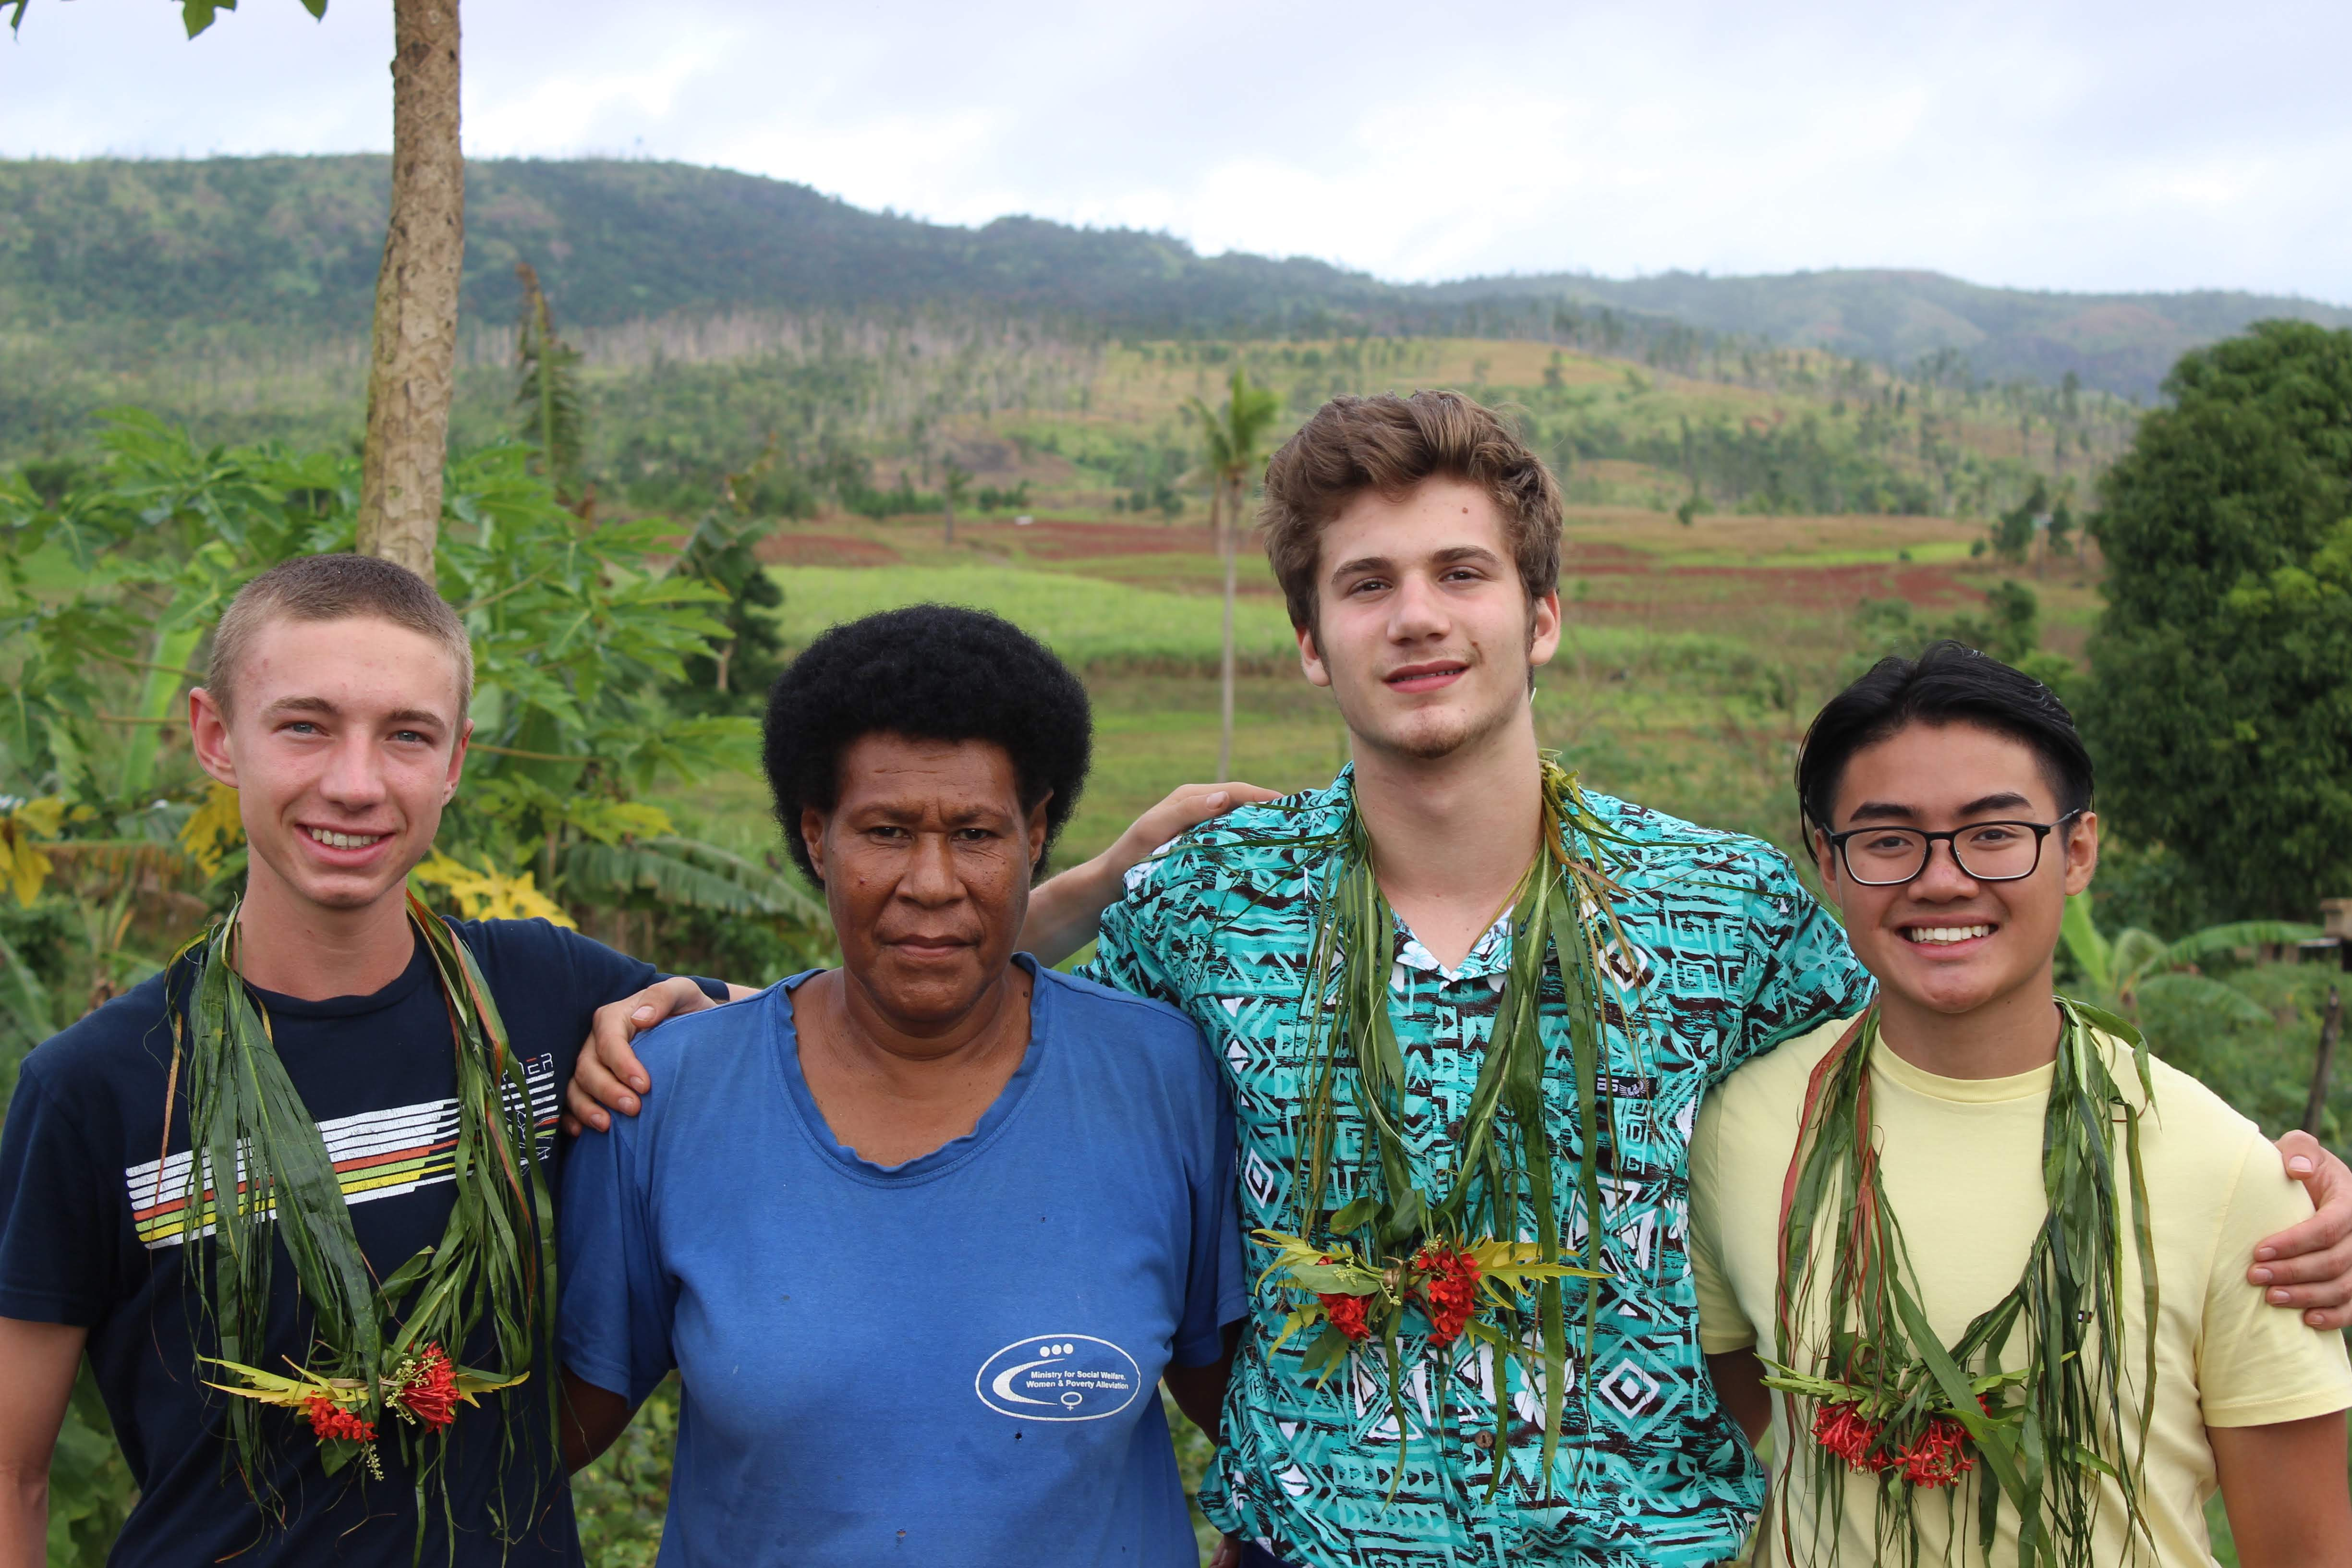 Summer Program - Literacy and Education | Global Works - New Zealand & Fiji Islands: Eco-Adventure